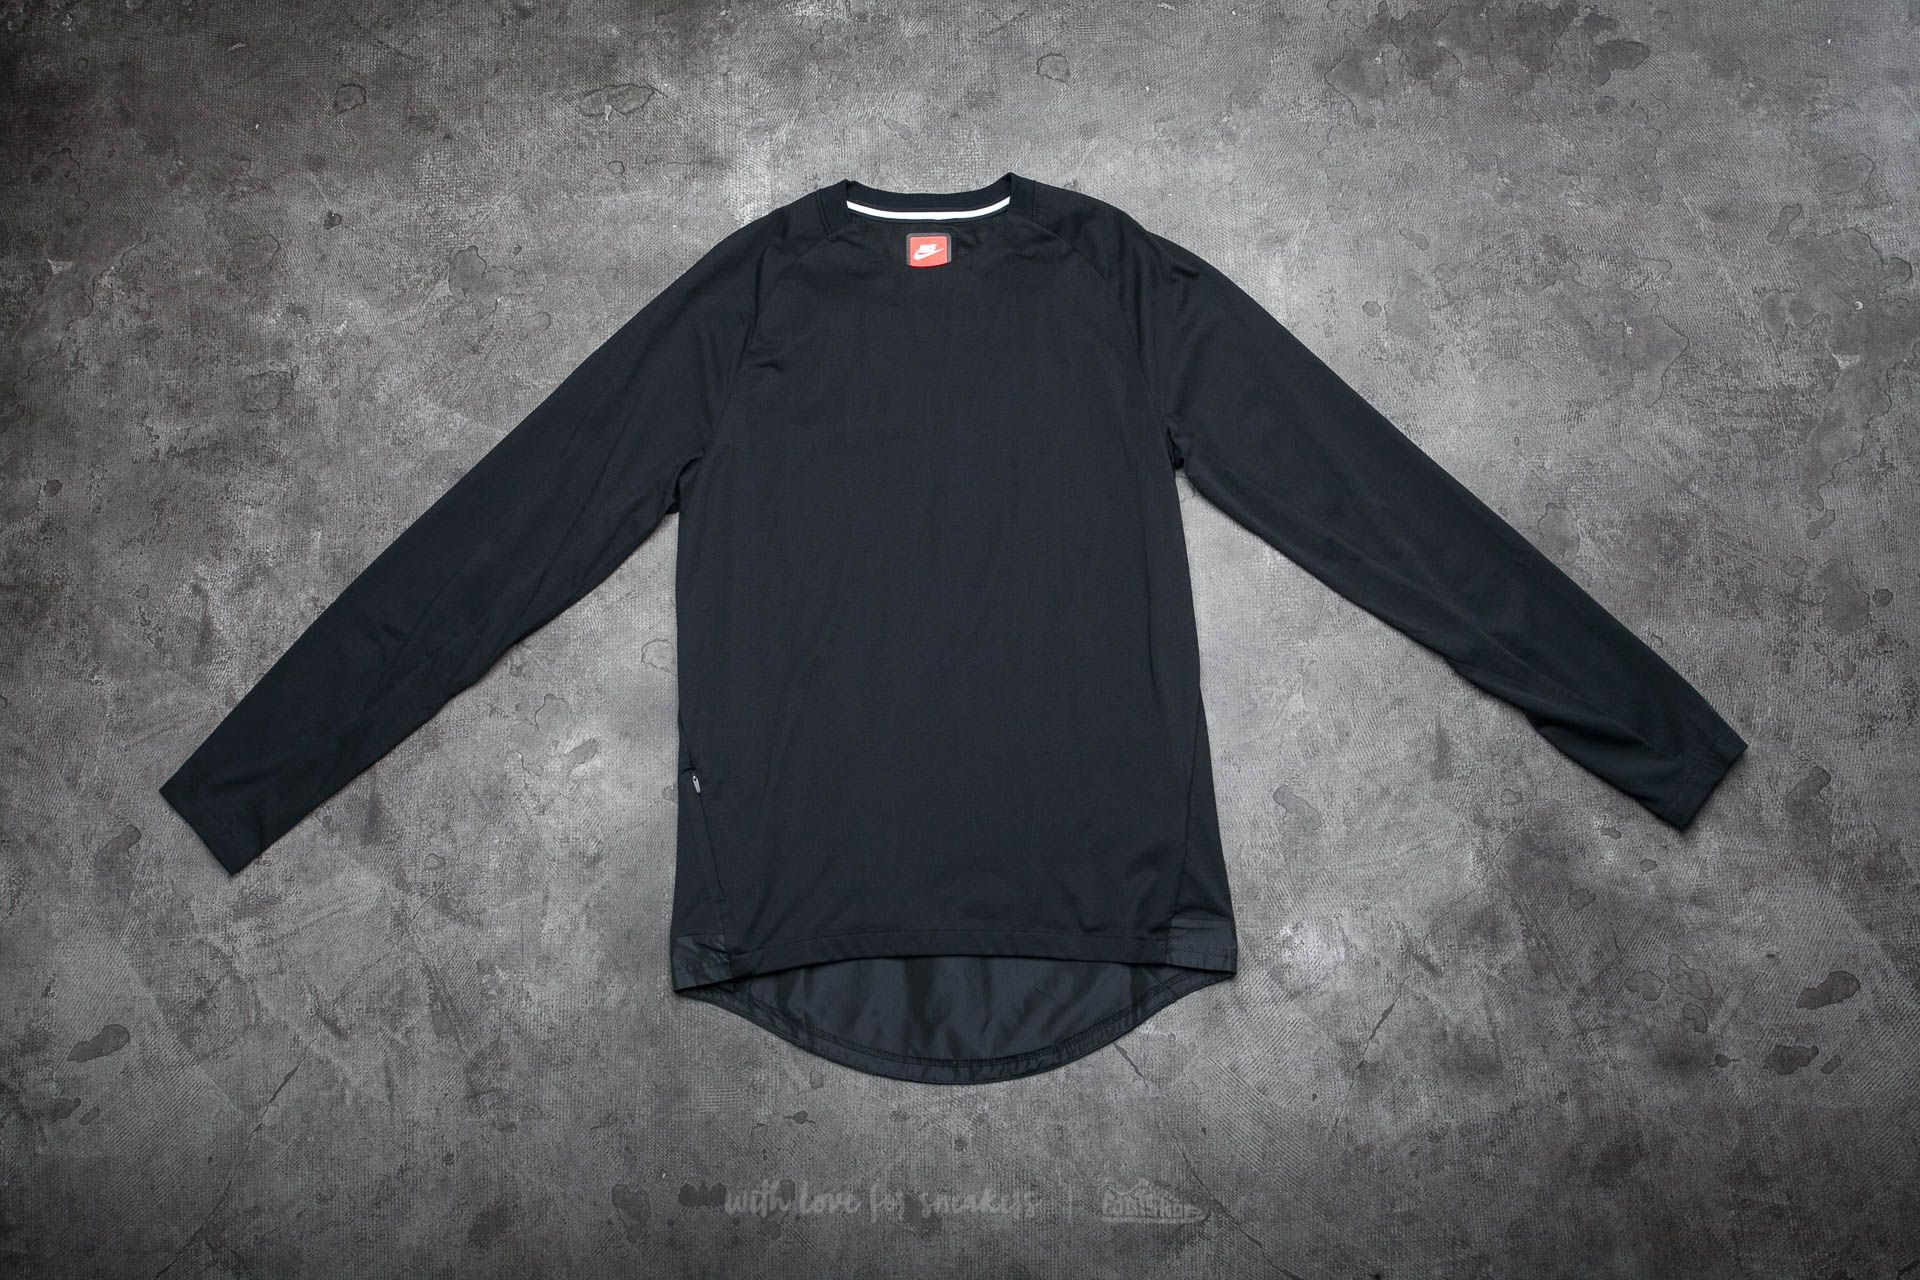 6213cdcb9bcd Nike Sportswear Bonded Men s Long Sleeve Top Black  Black ...